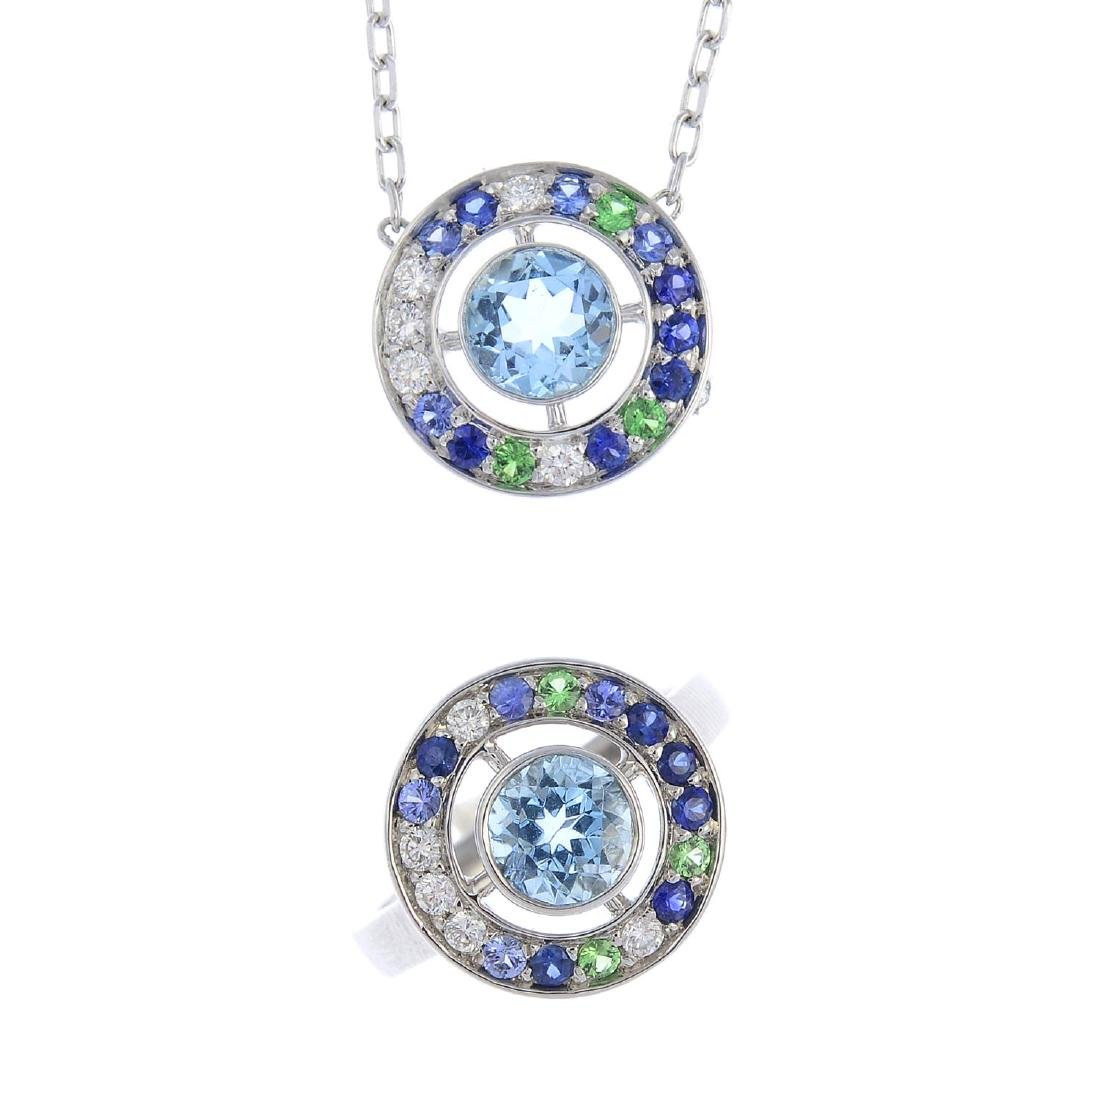 BOUCHERON - a group of diamond and gem-set 'Ava'